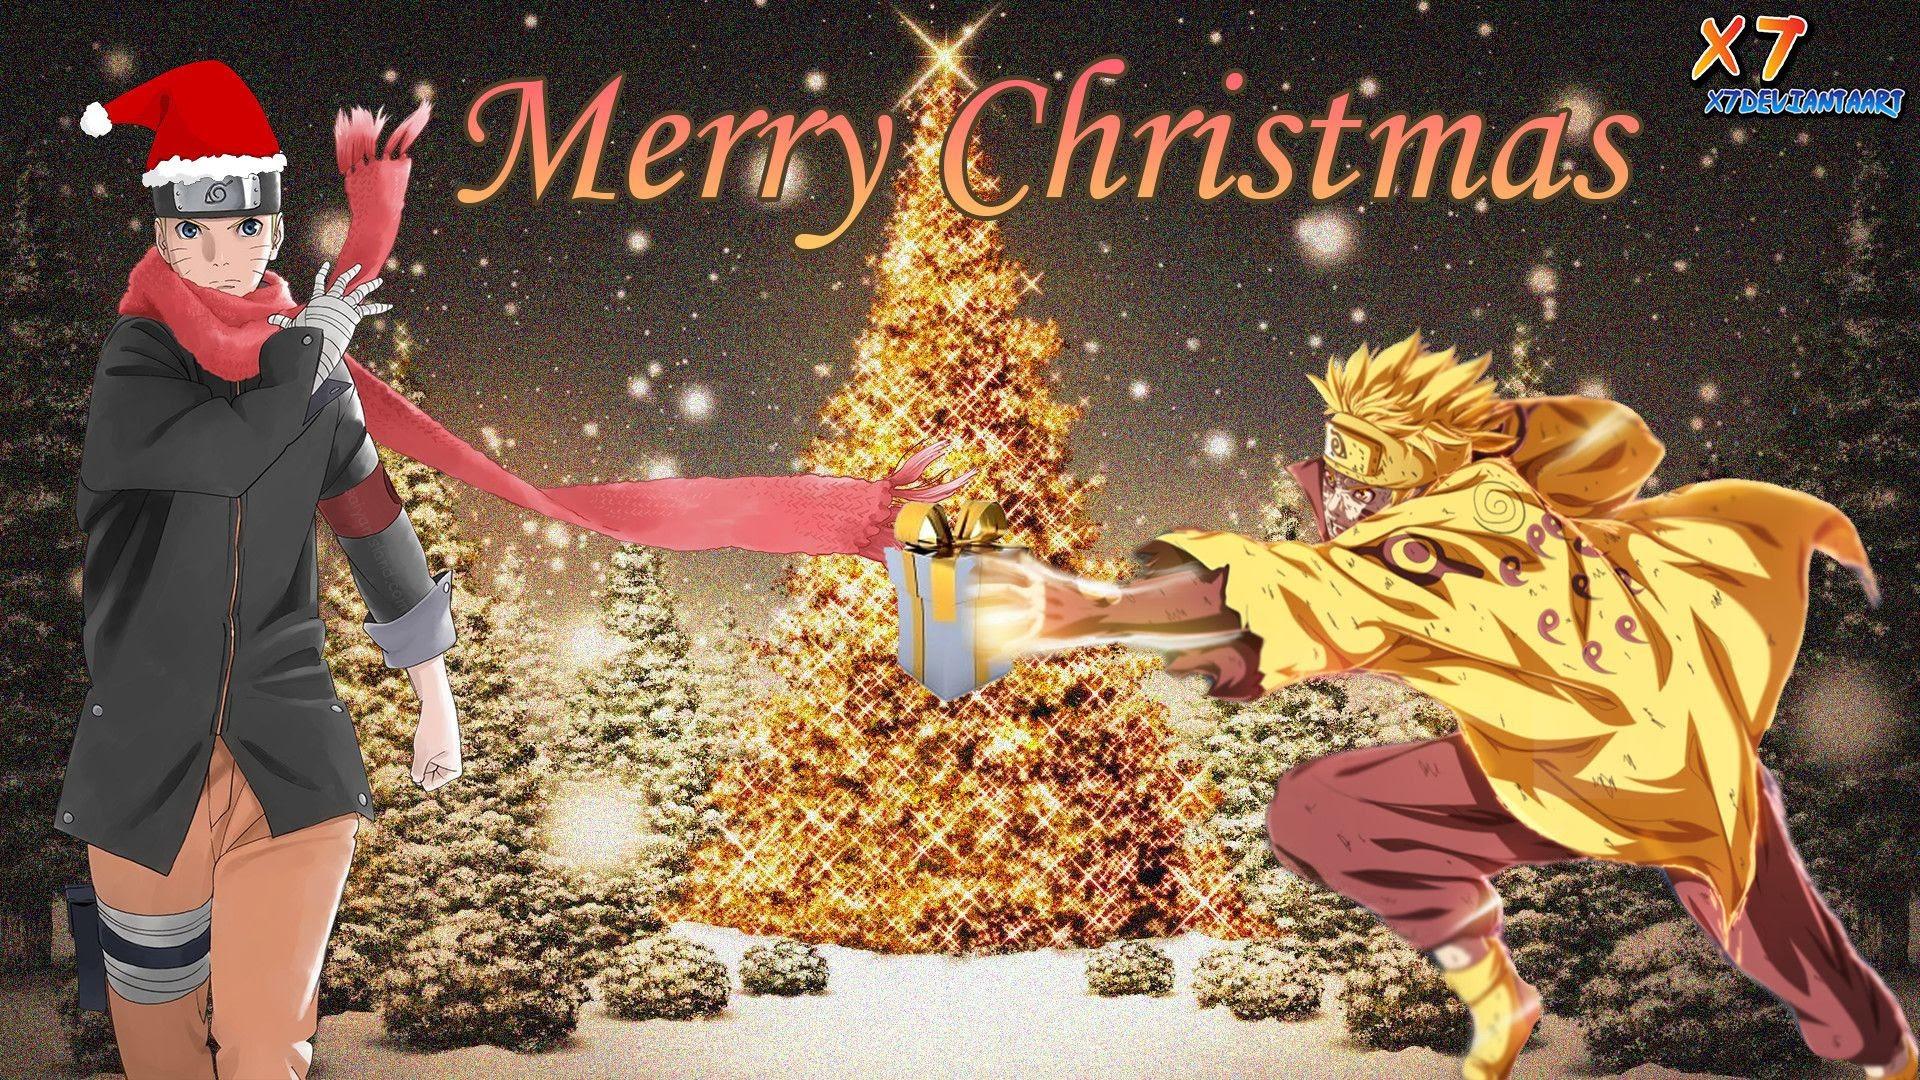 Naruto Christmas Wallpaper 61 Images